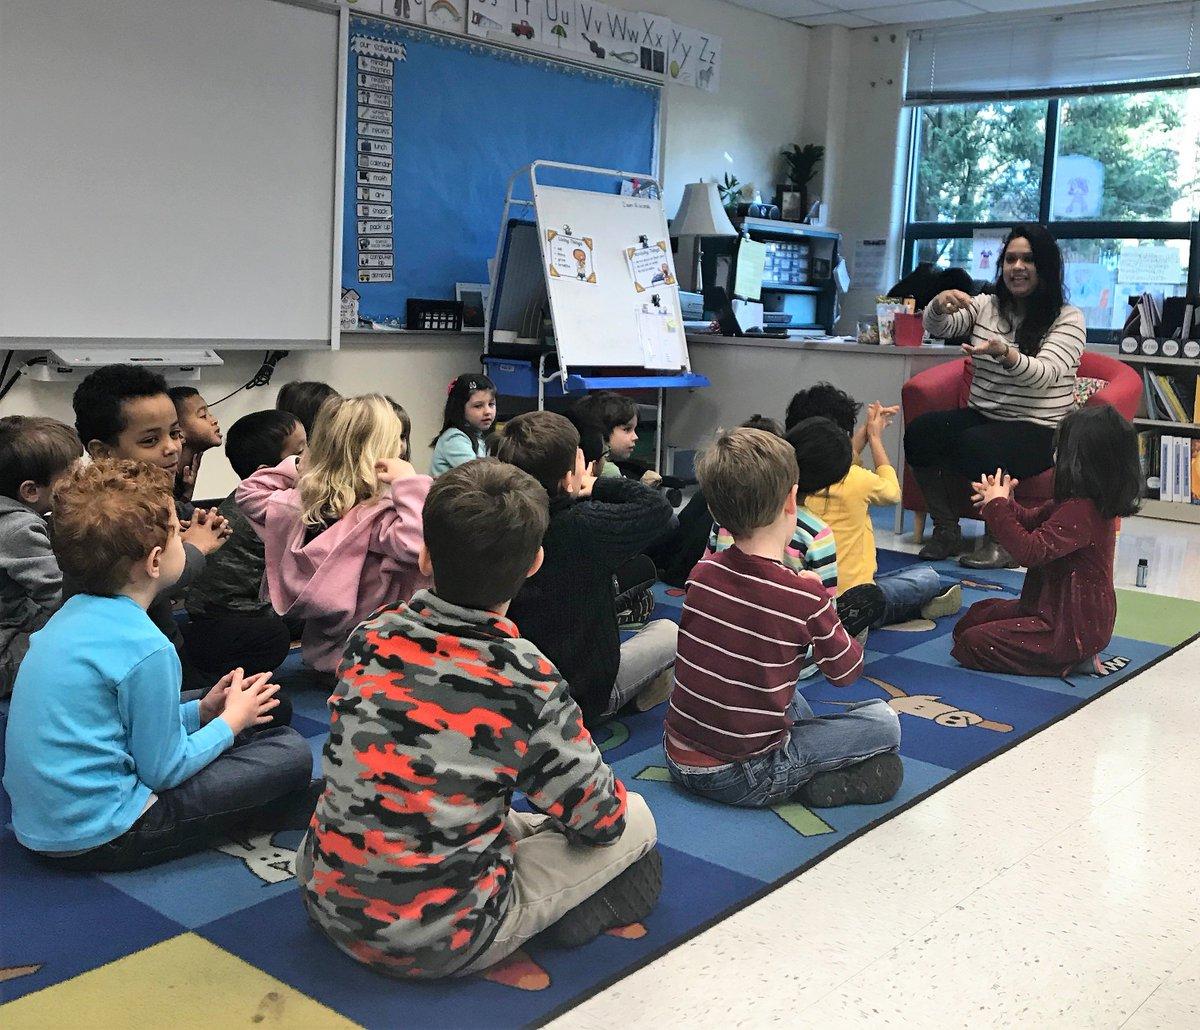 School Health demonstrates hand washing in a Kindergarten Classroom ! ✋🤚 <a target='_blank' href='http://twitter.com/APSVirginia'>@APSVirginia</a> <a target='_blank' href='https://t.co/F1hUMzebxs'>https://t.co/F1hUMzebxs</a>